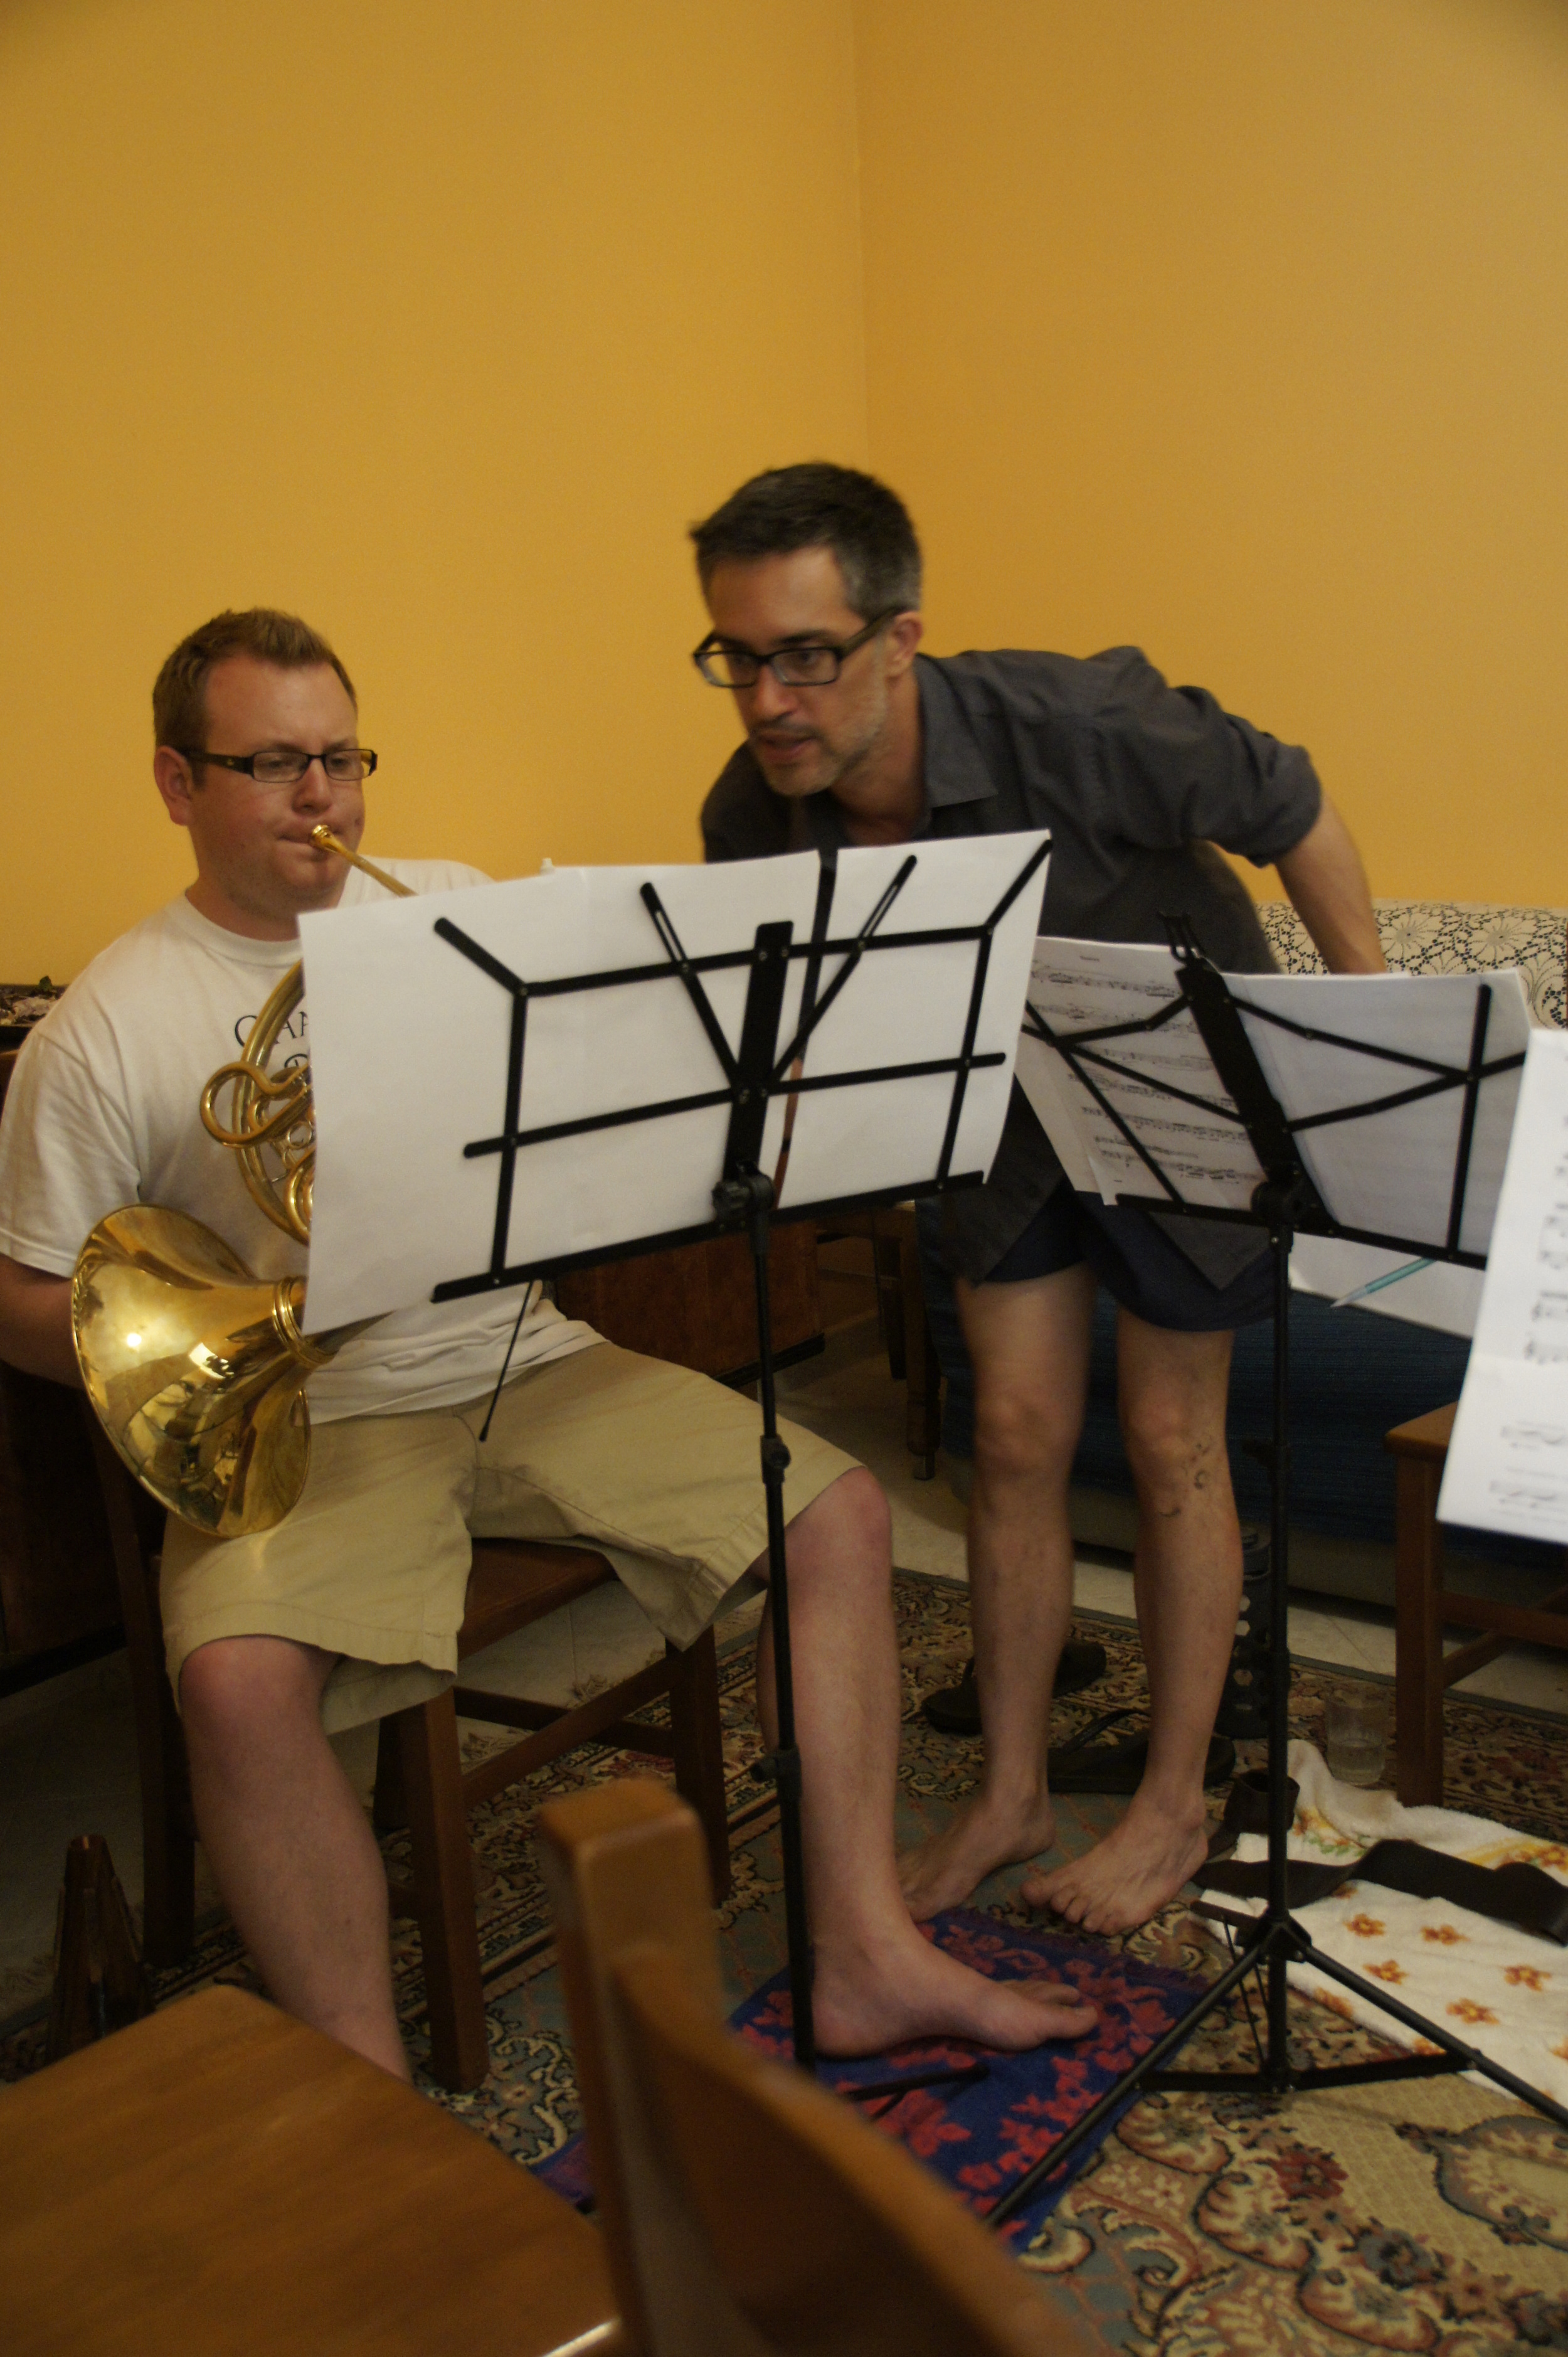 Collaborating with composer Libero Mureddu